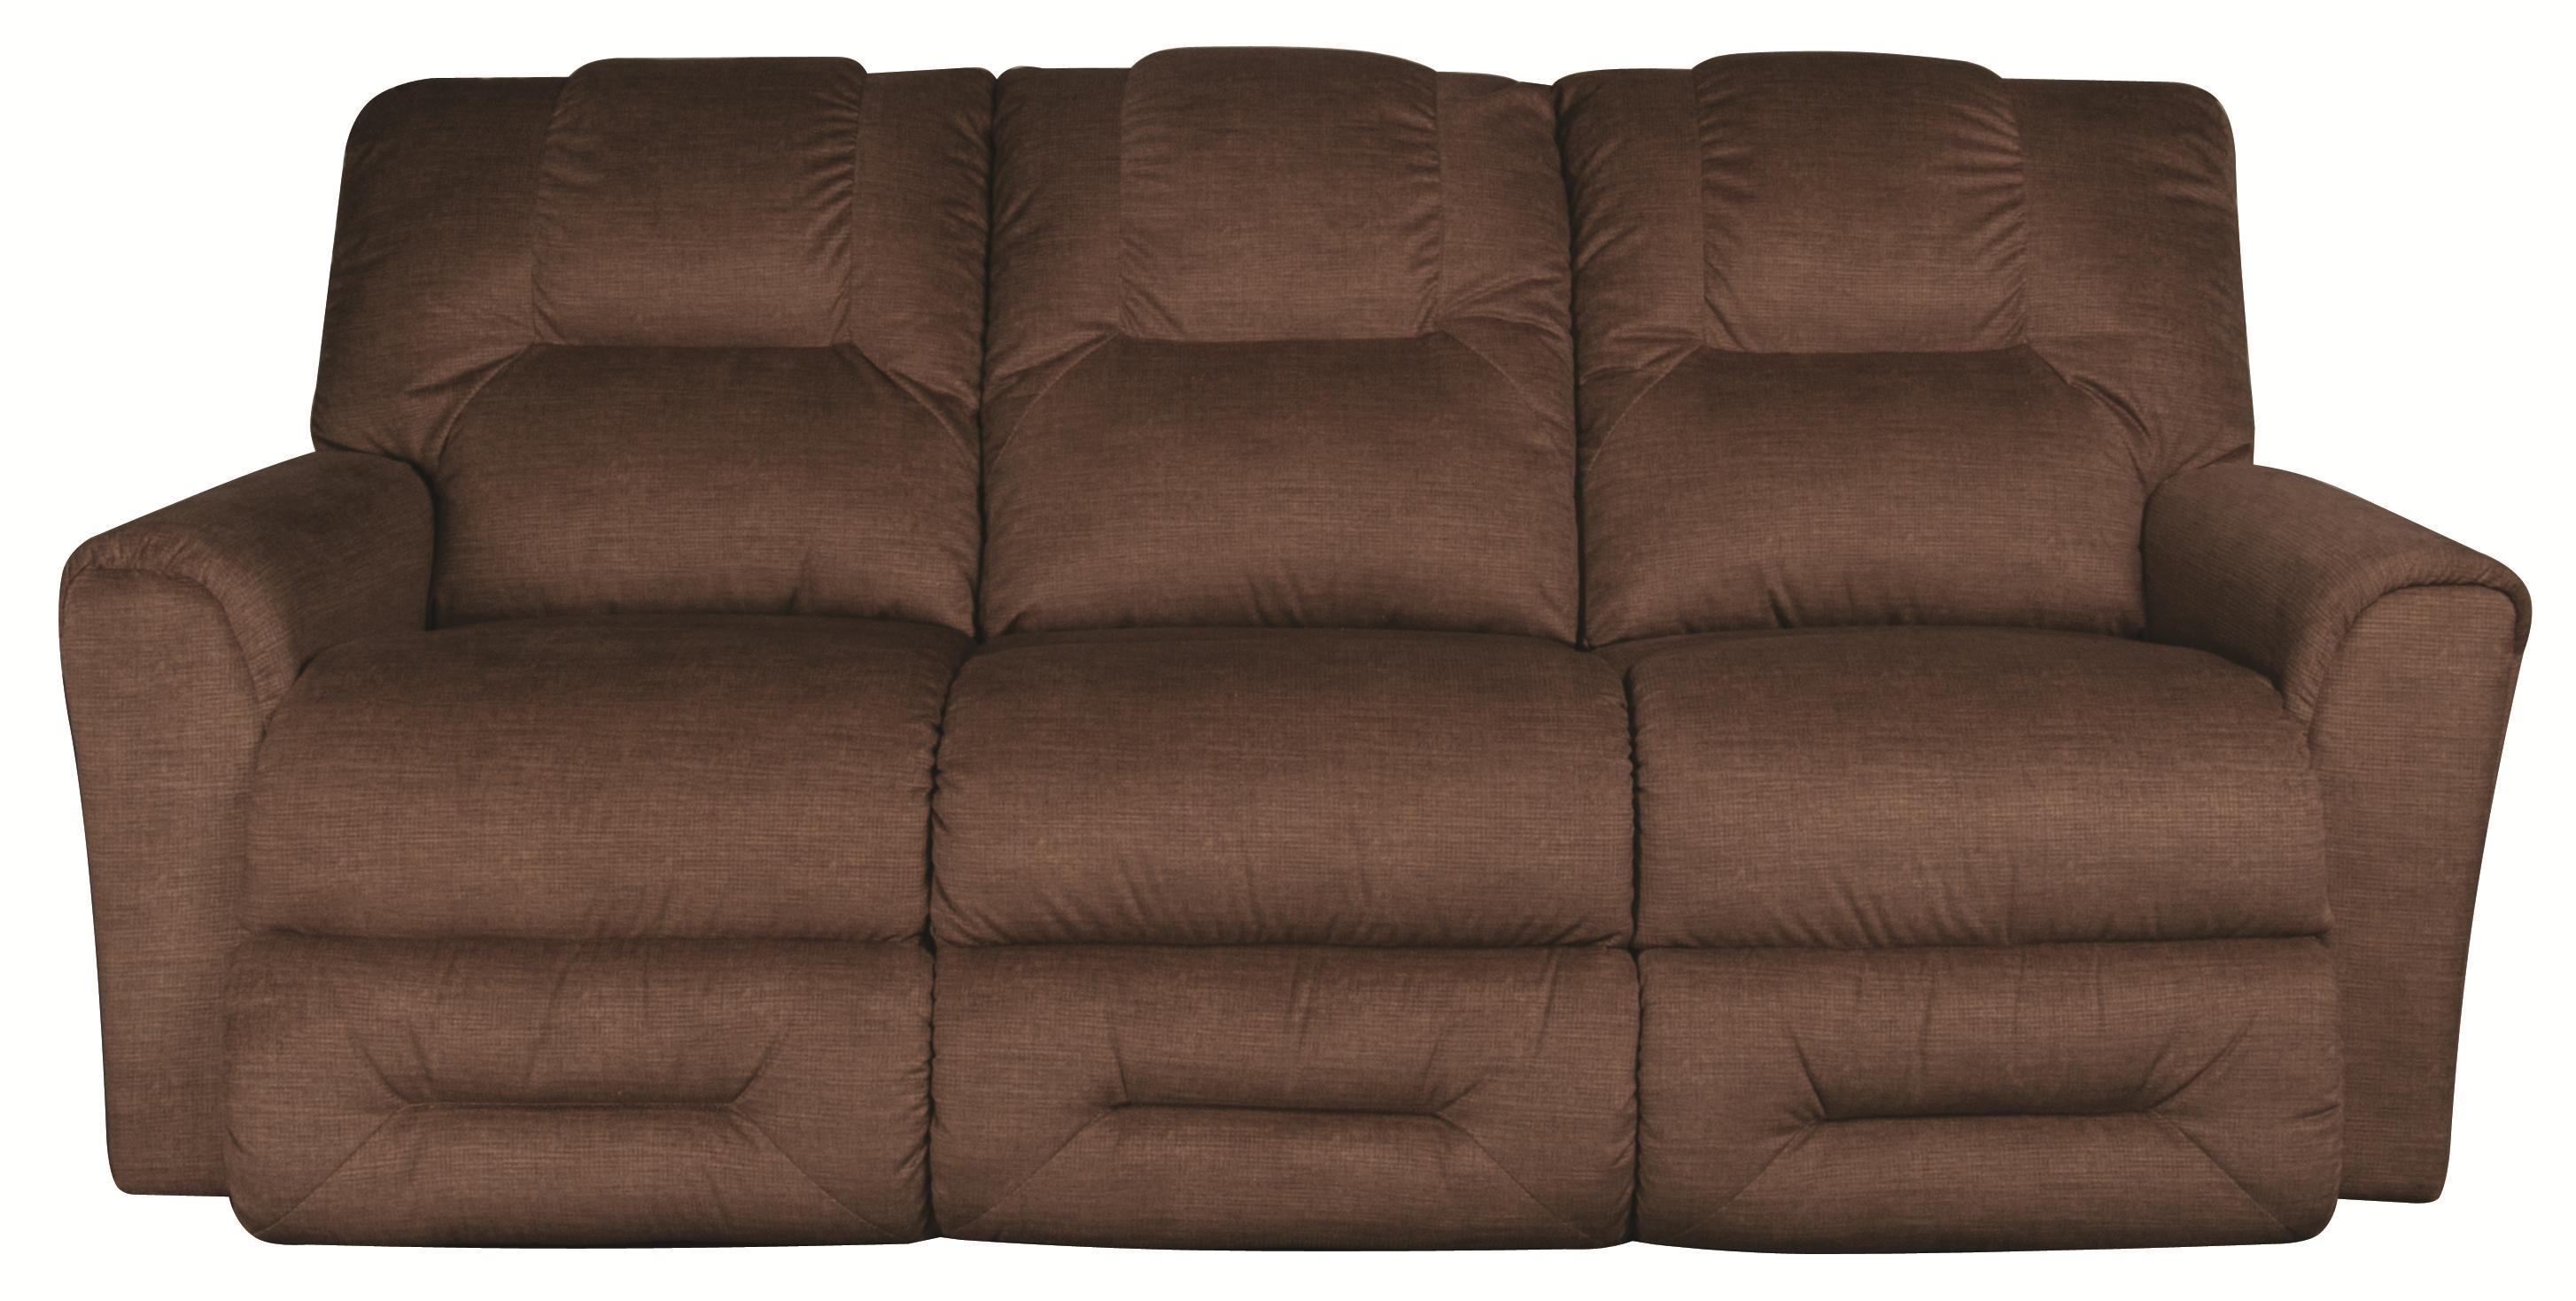 La-Z-Boy Easton Easton Reclining Sofa - Item Number: 102810029